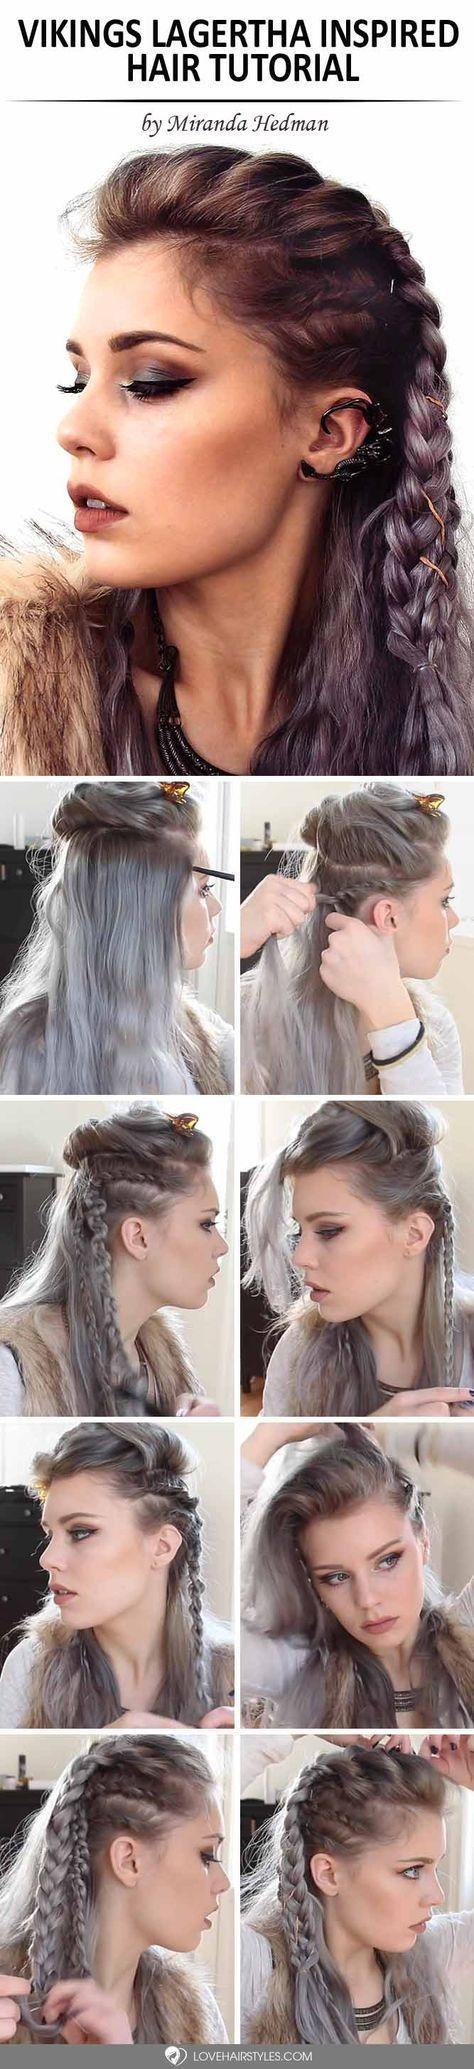 Vikings Lagertha Hair Tutorial – anas Messy Braids